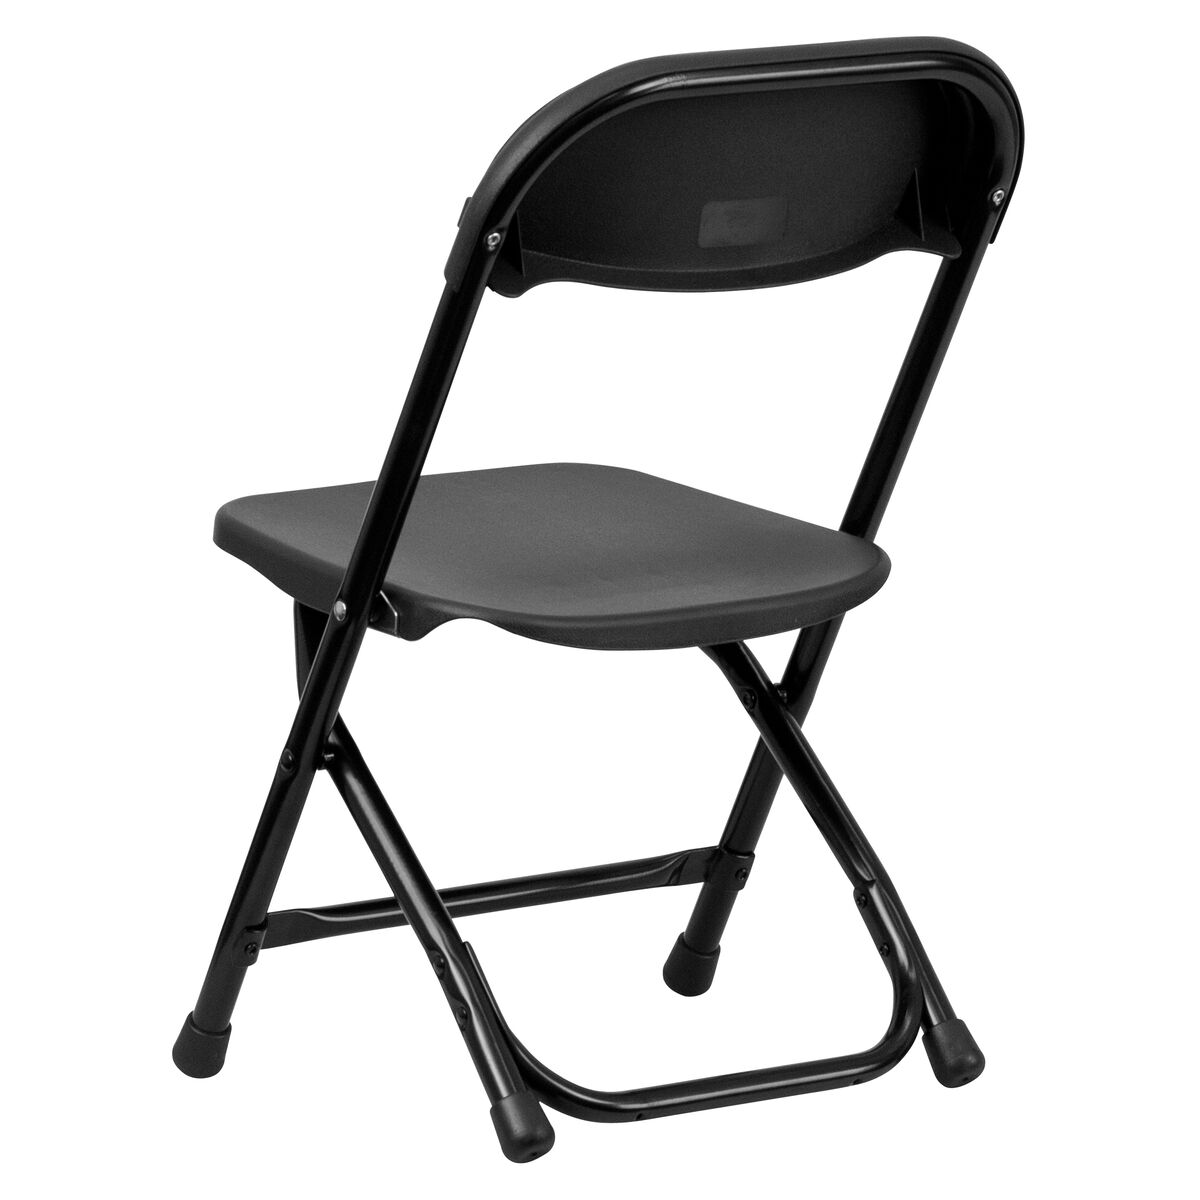 Kids Black Plastic Folding Chair - Inset 2